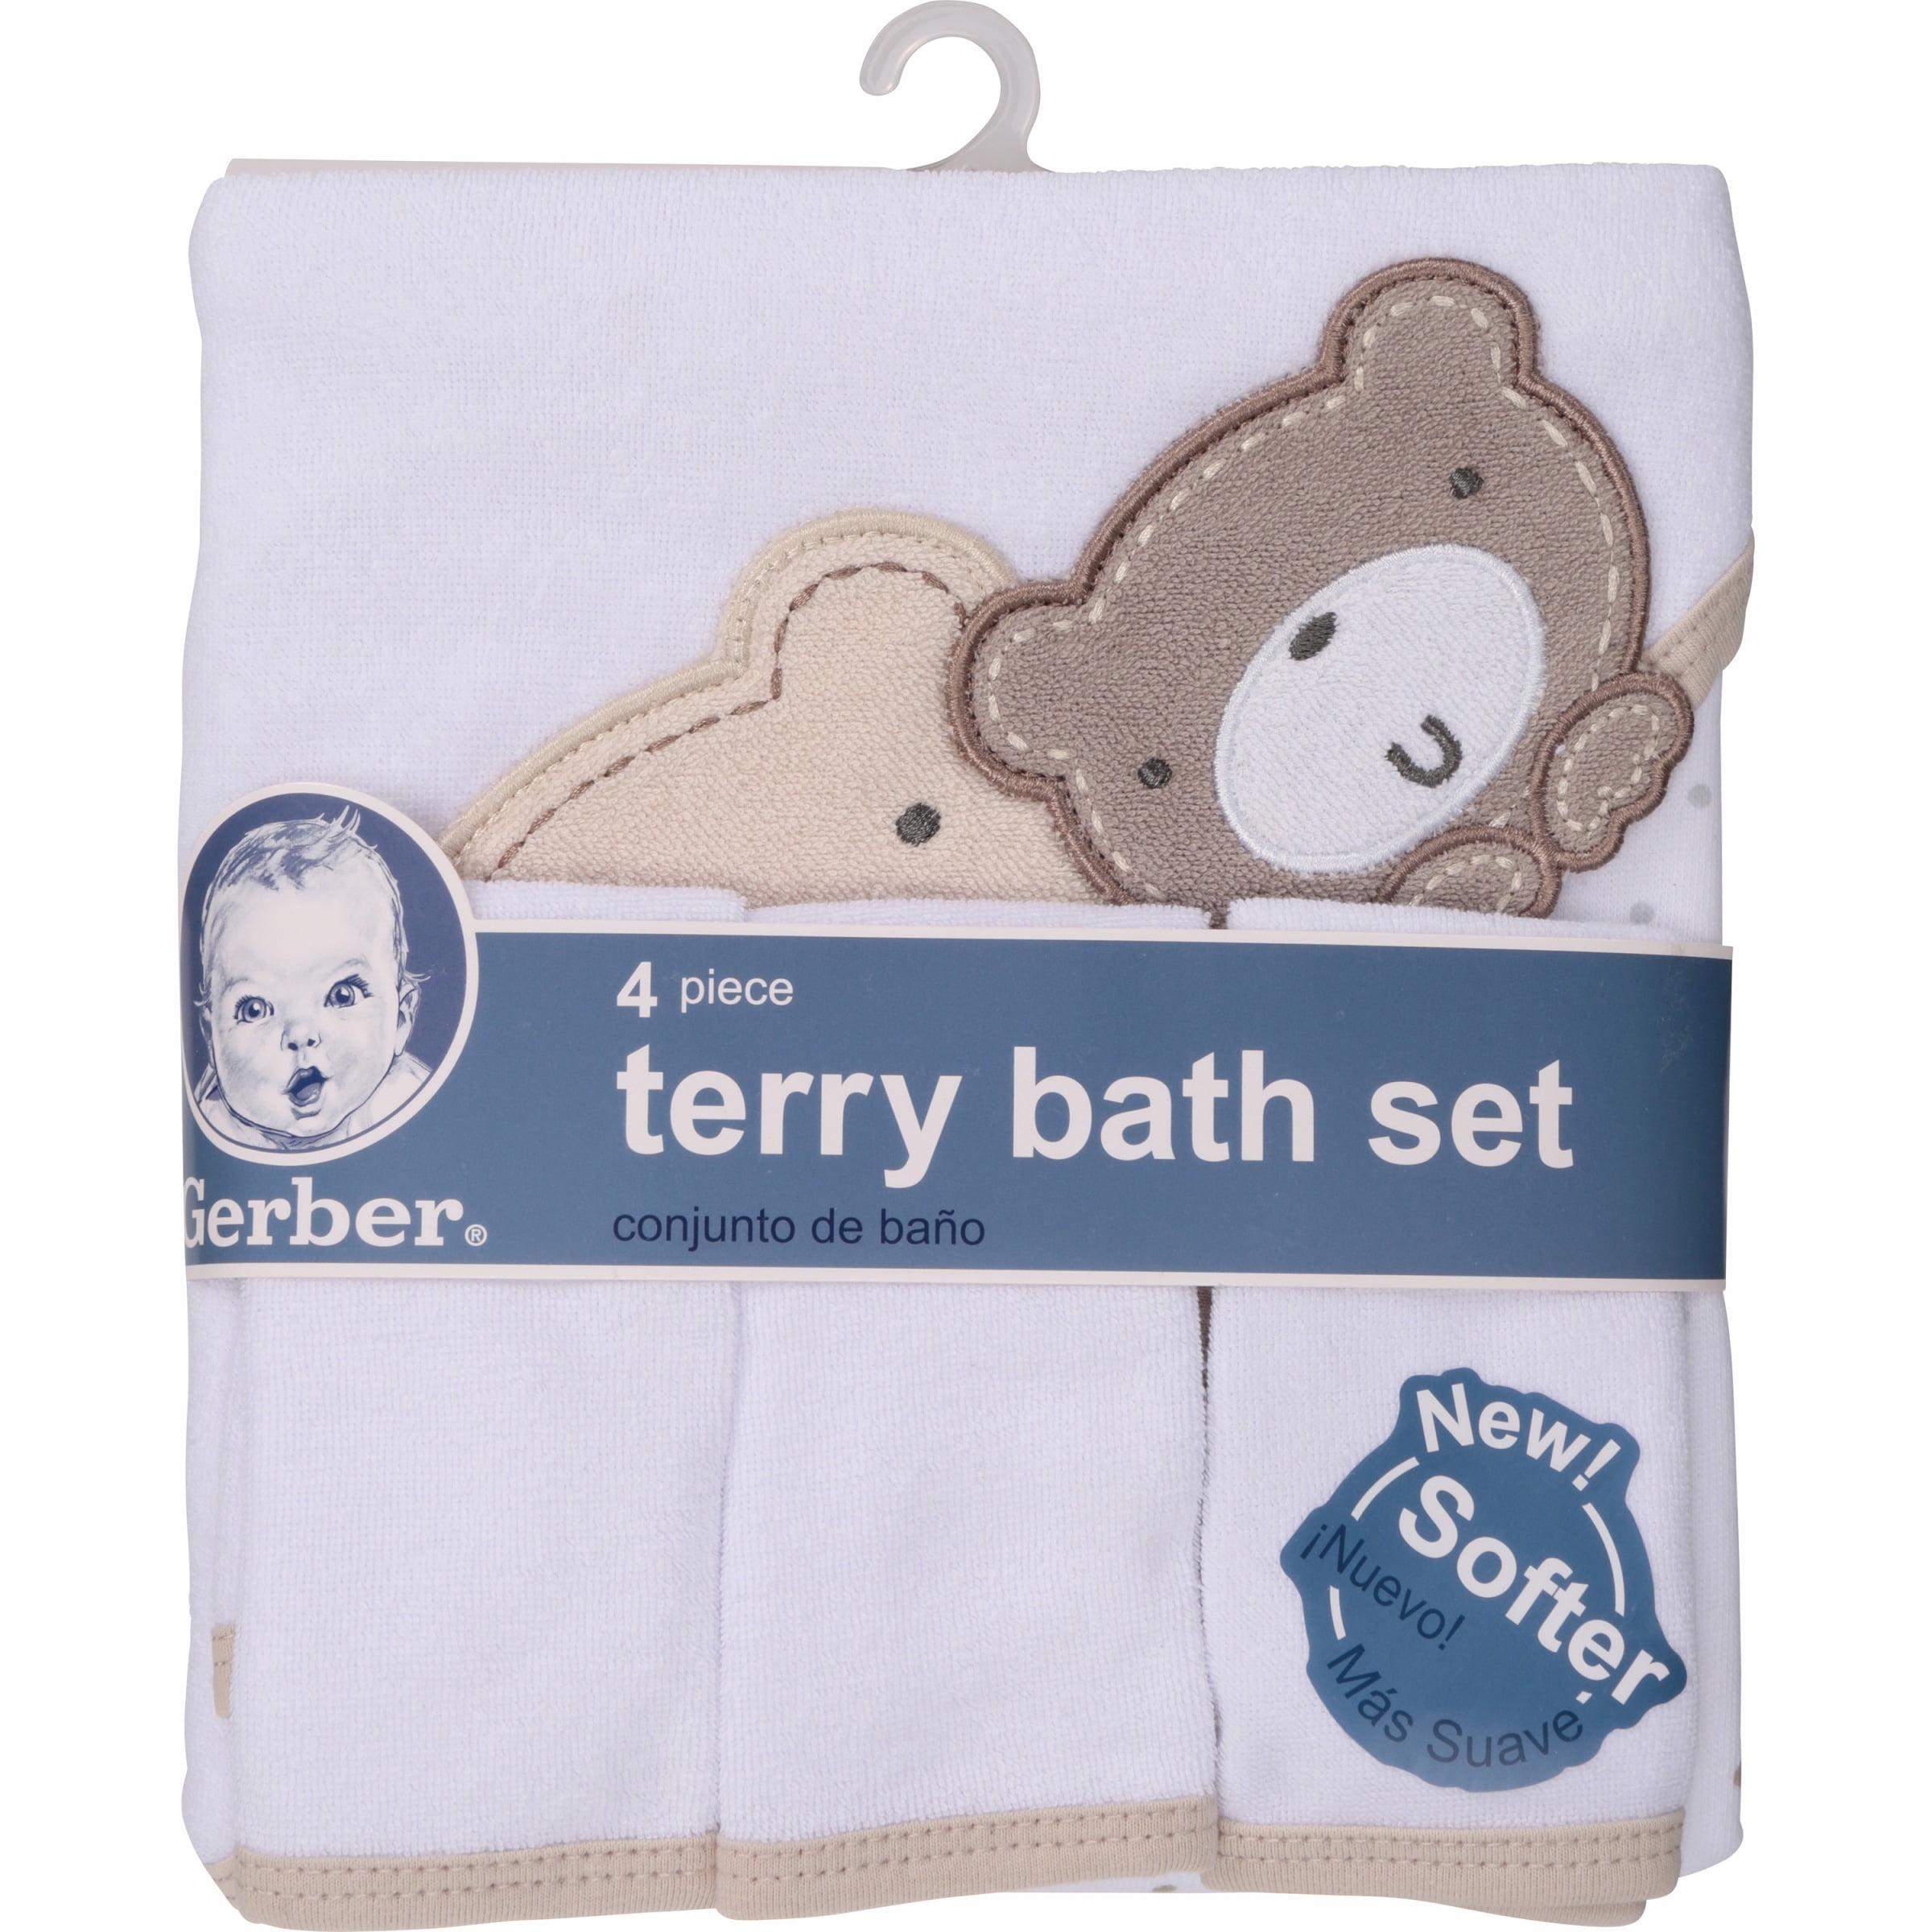 Gerber Newborn Baby Towel and Washcloths Bath Gift Set, Bears, 4 Piece